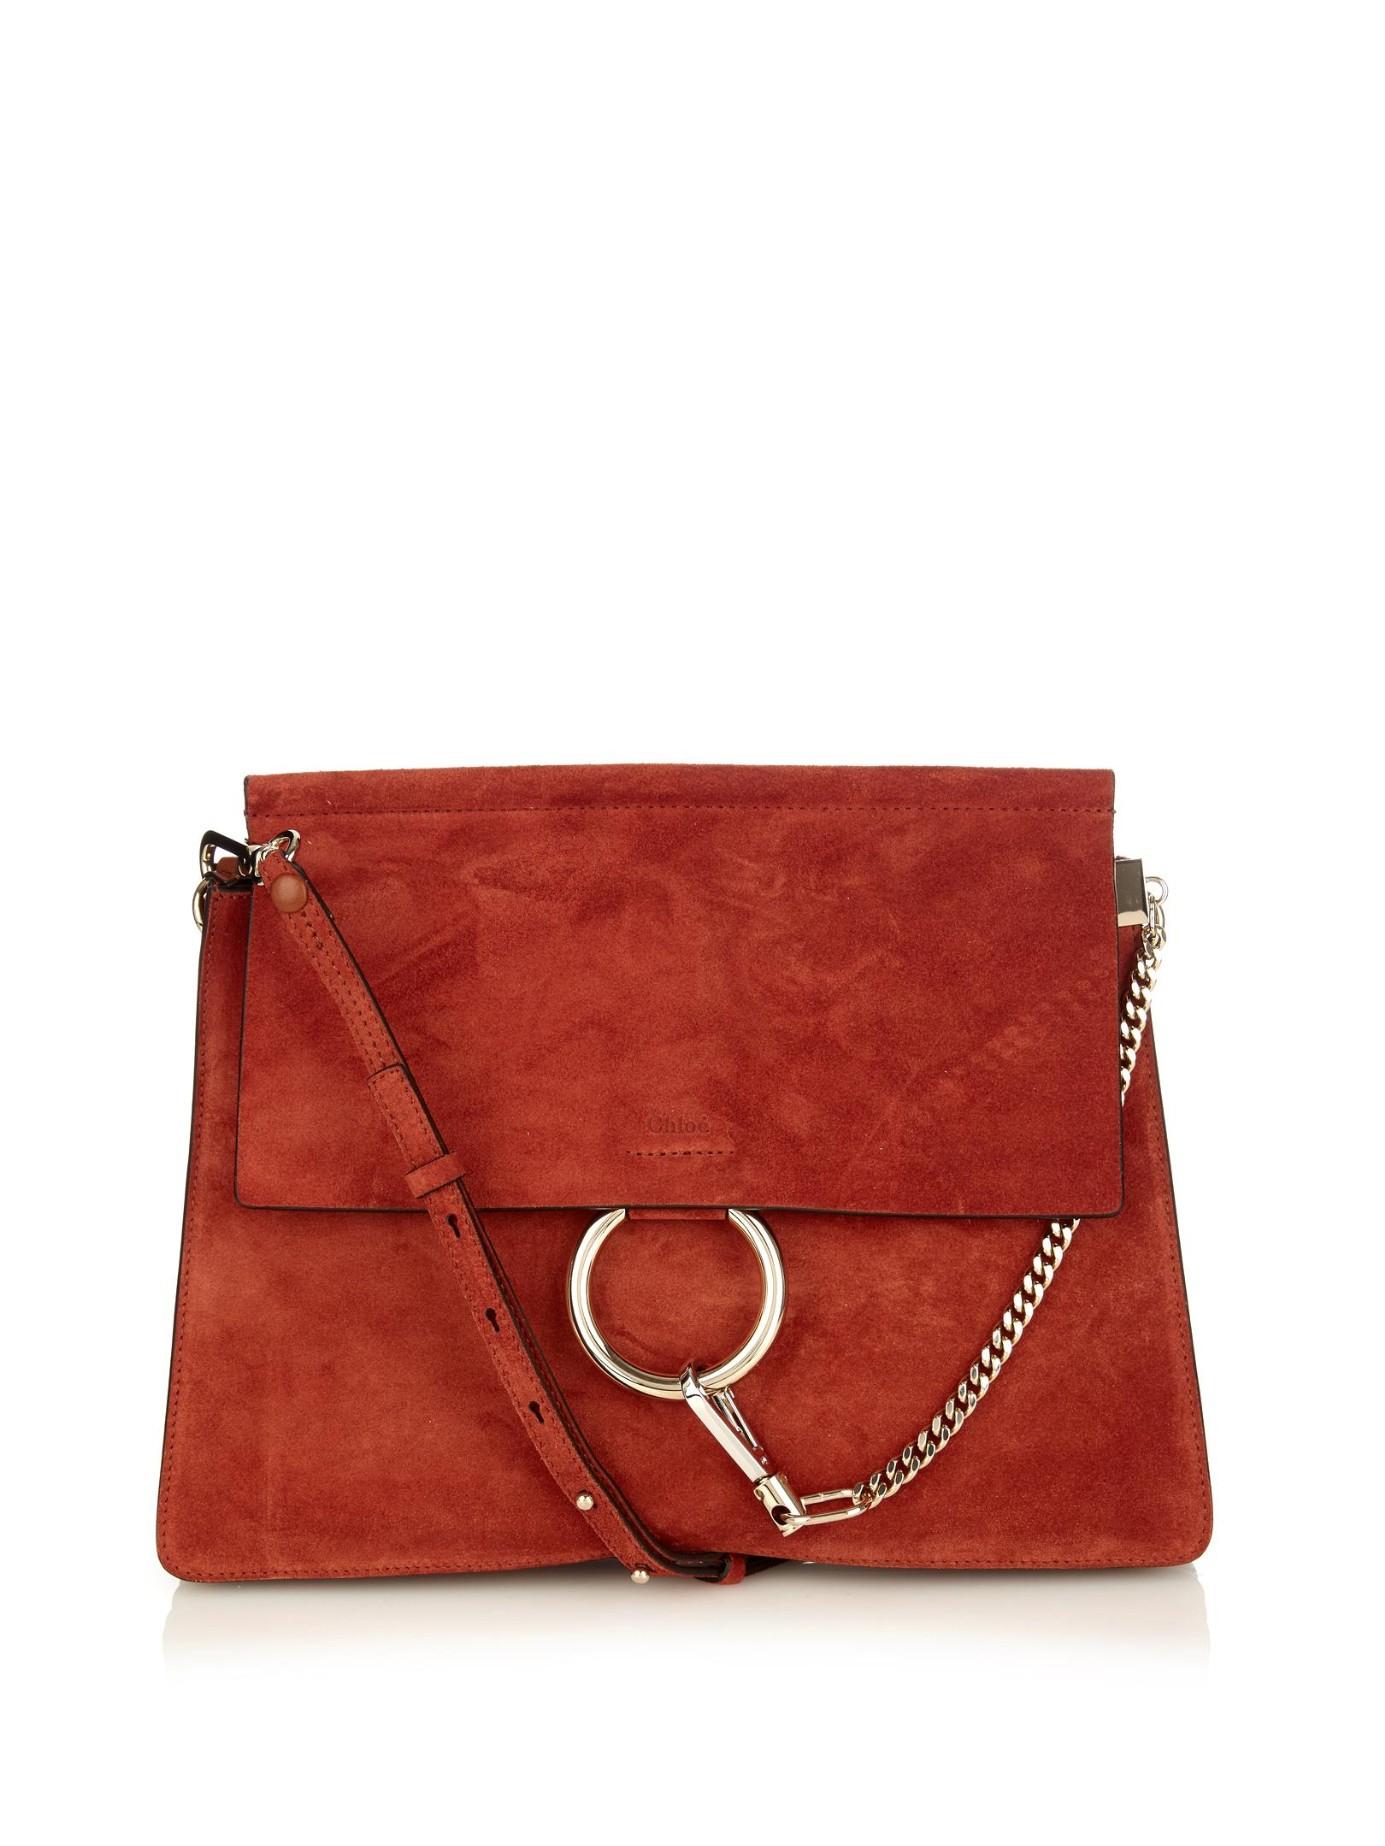 443b4d0ea Chloe Faye Bracelet Bag Red | Stanford Center for Opportunity Policy ...